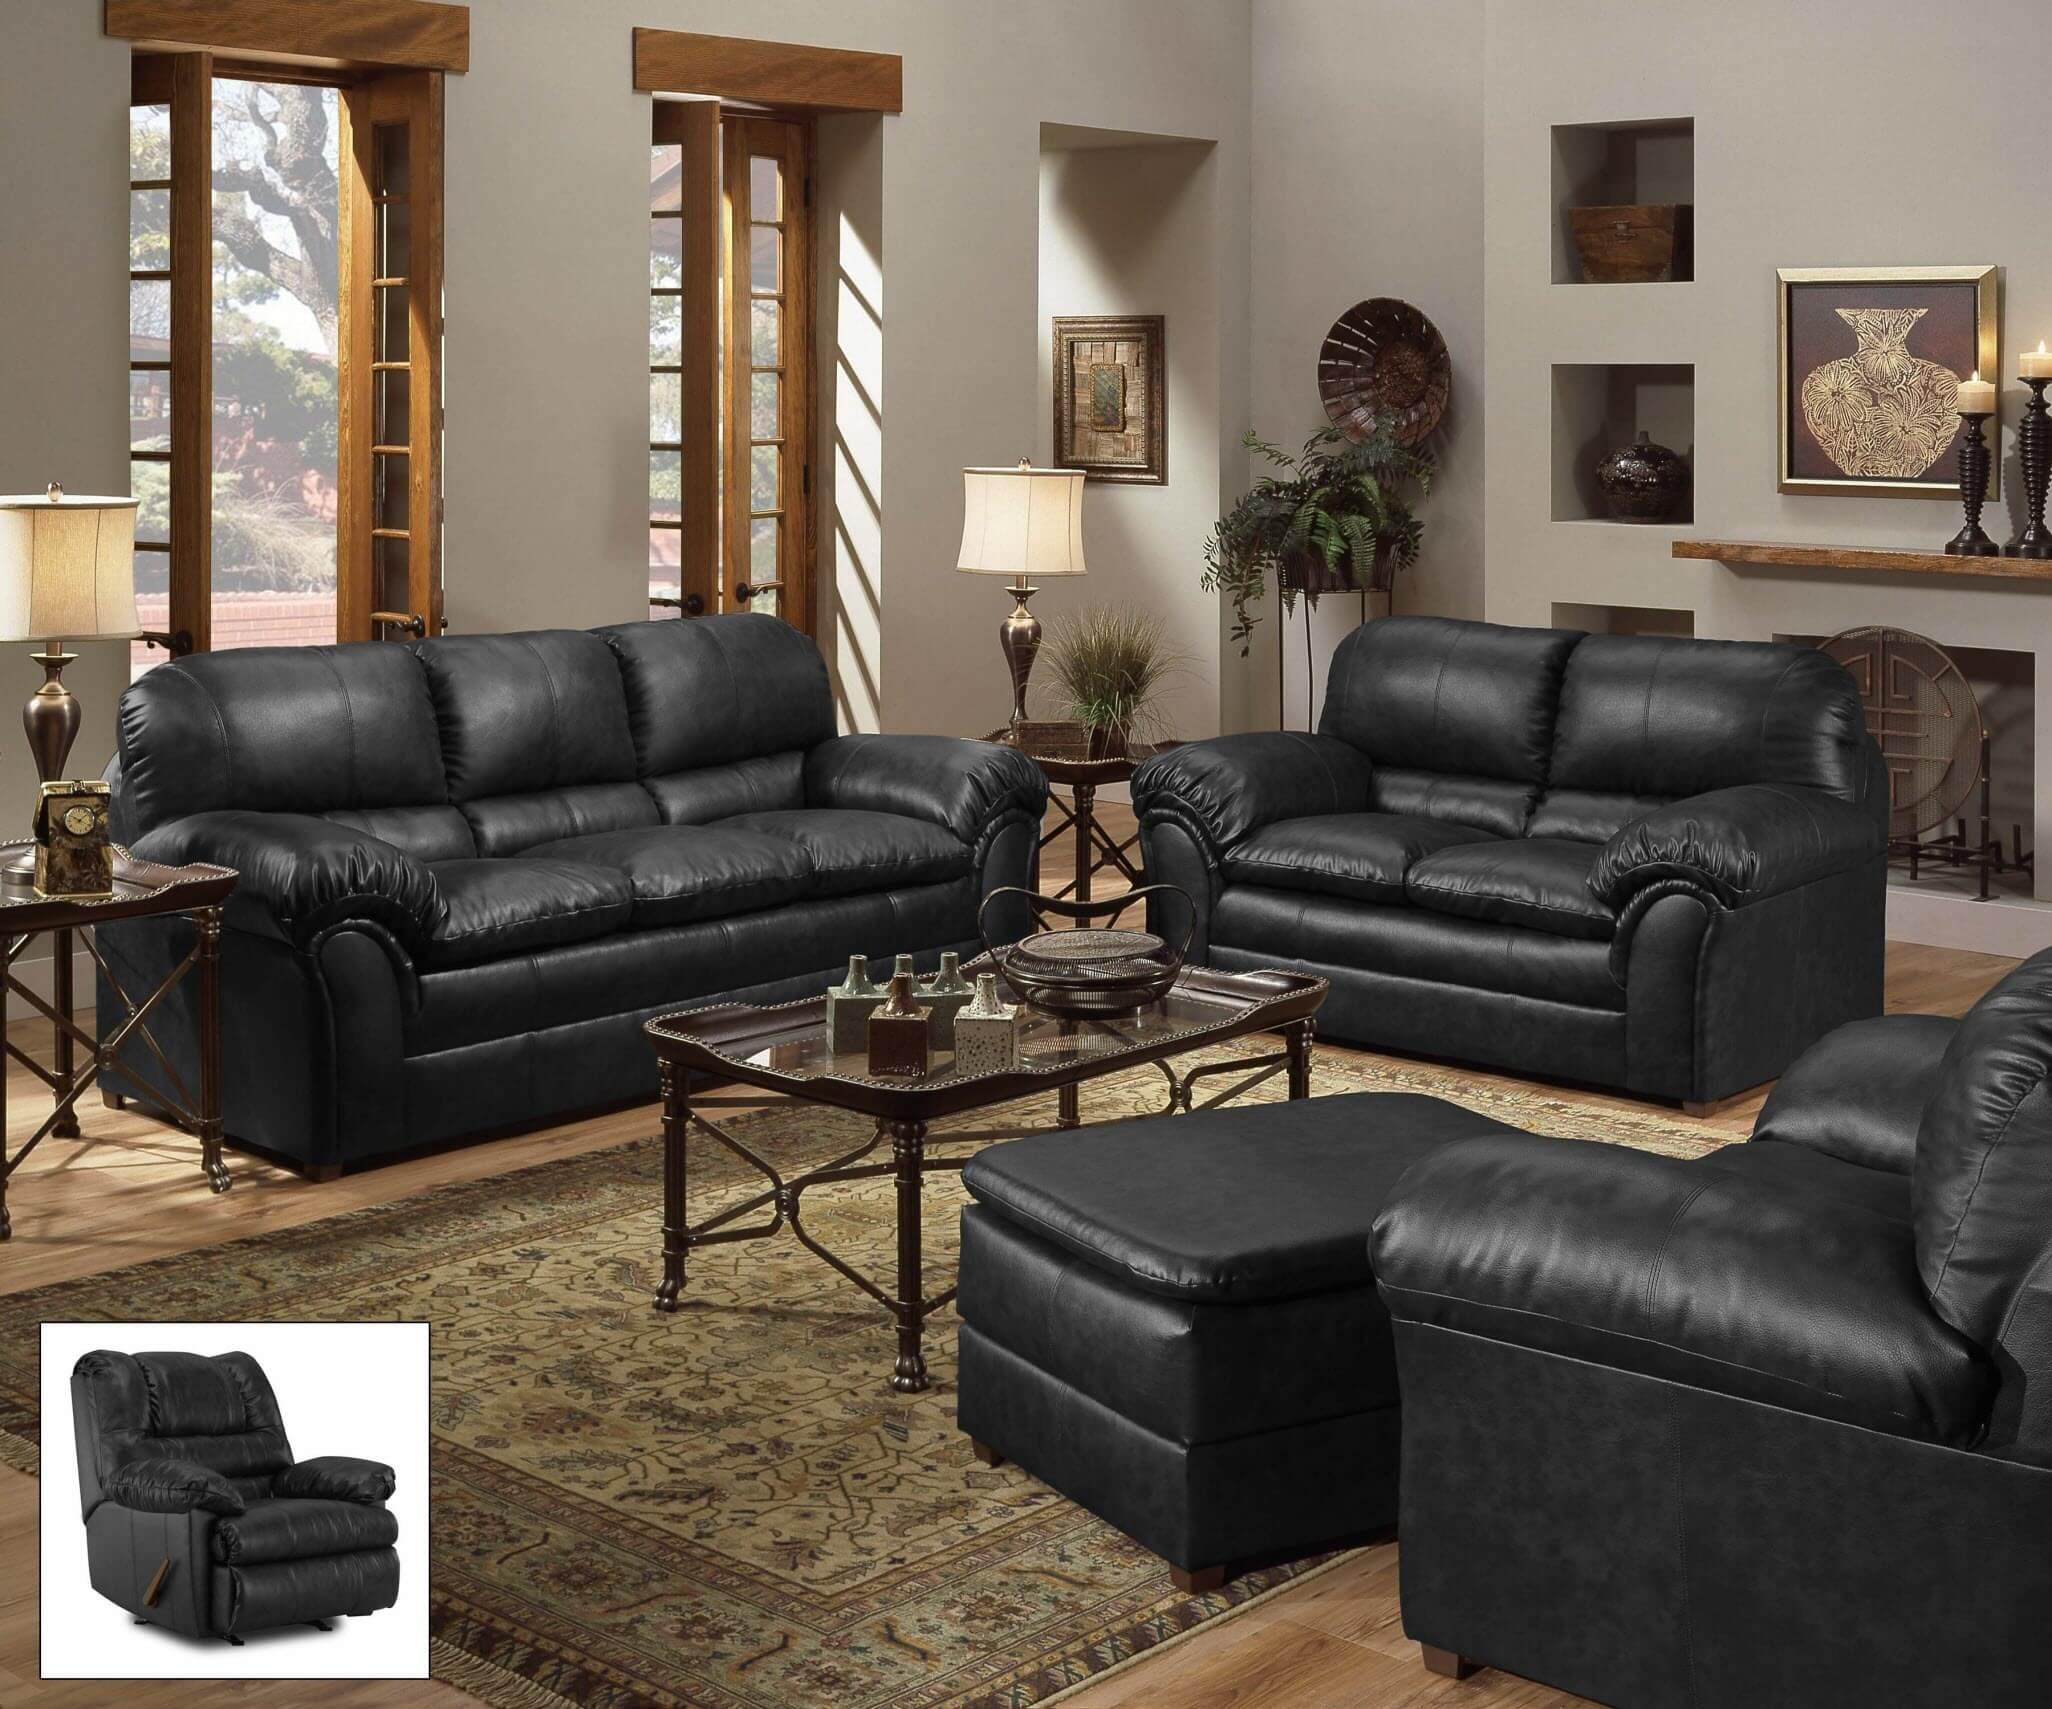 Outstanding 6152 Simmons Geneva Onyx Sofa And Loveseat Discontinued Frankydiablos Diy Chair Ideas Frankydiabloscom